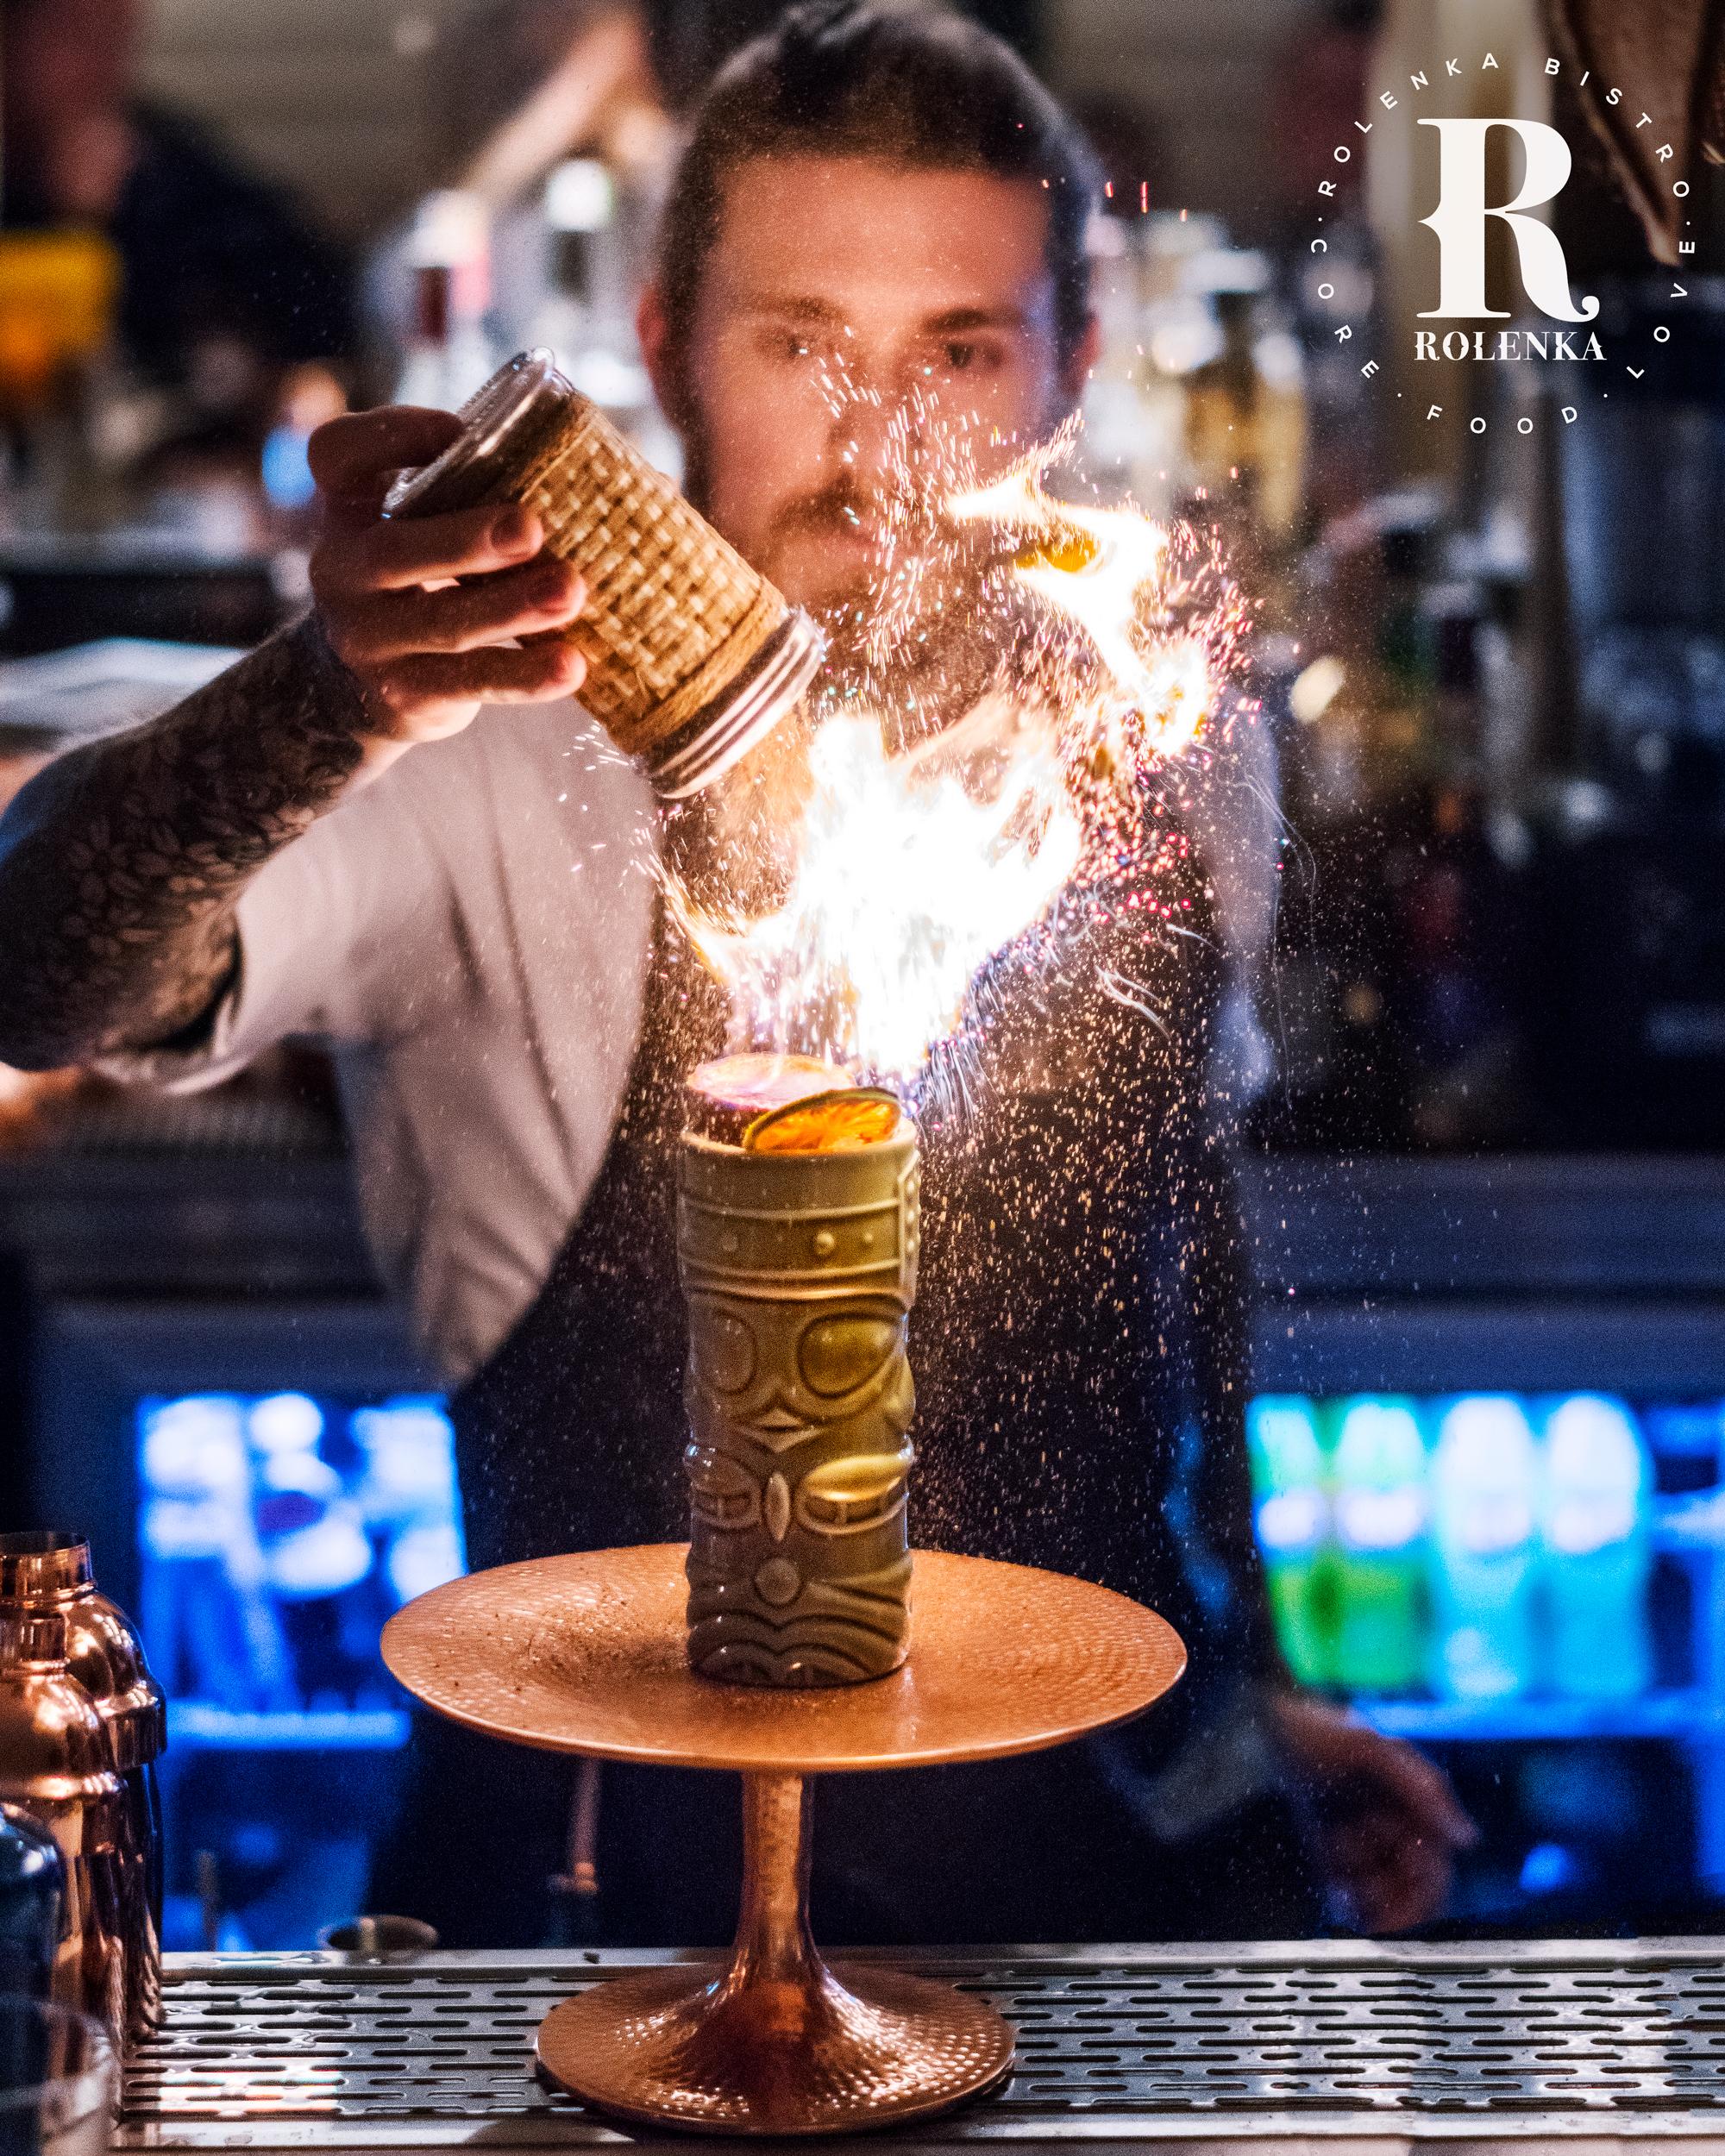 bar-rolenka